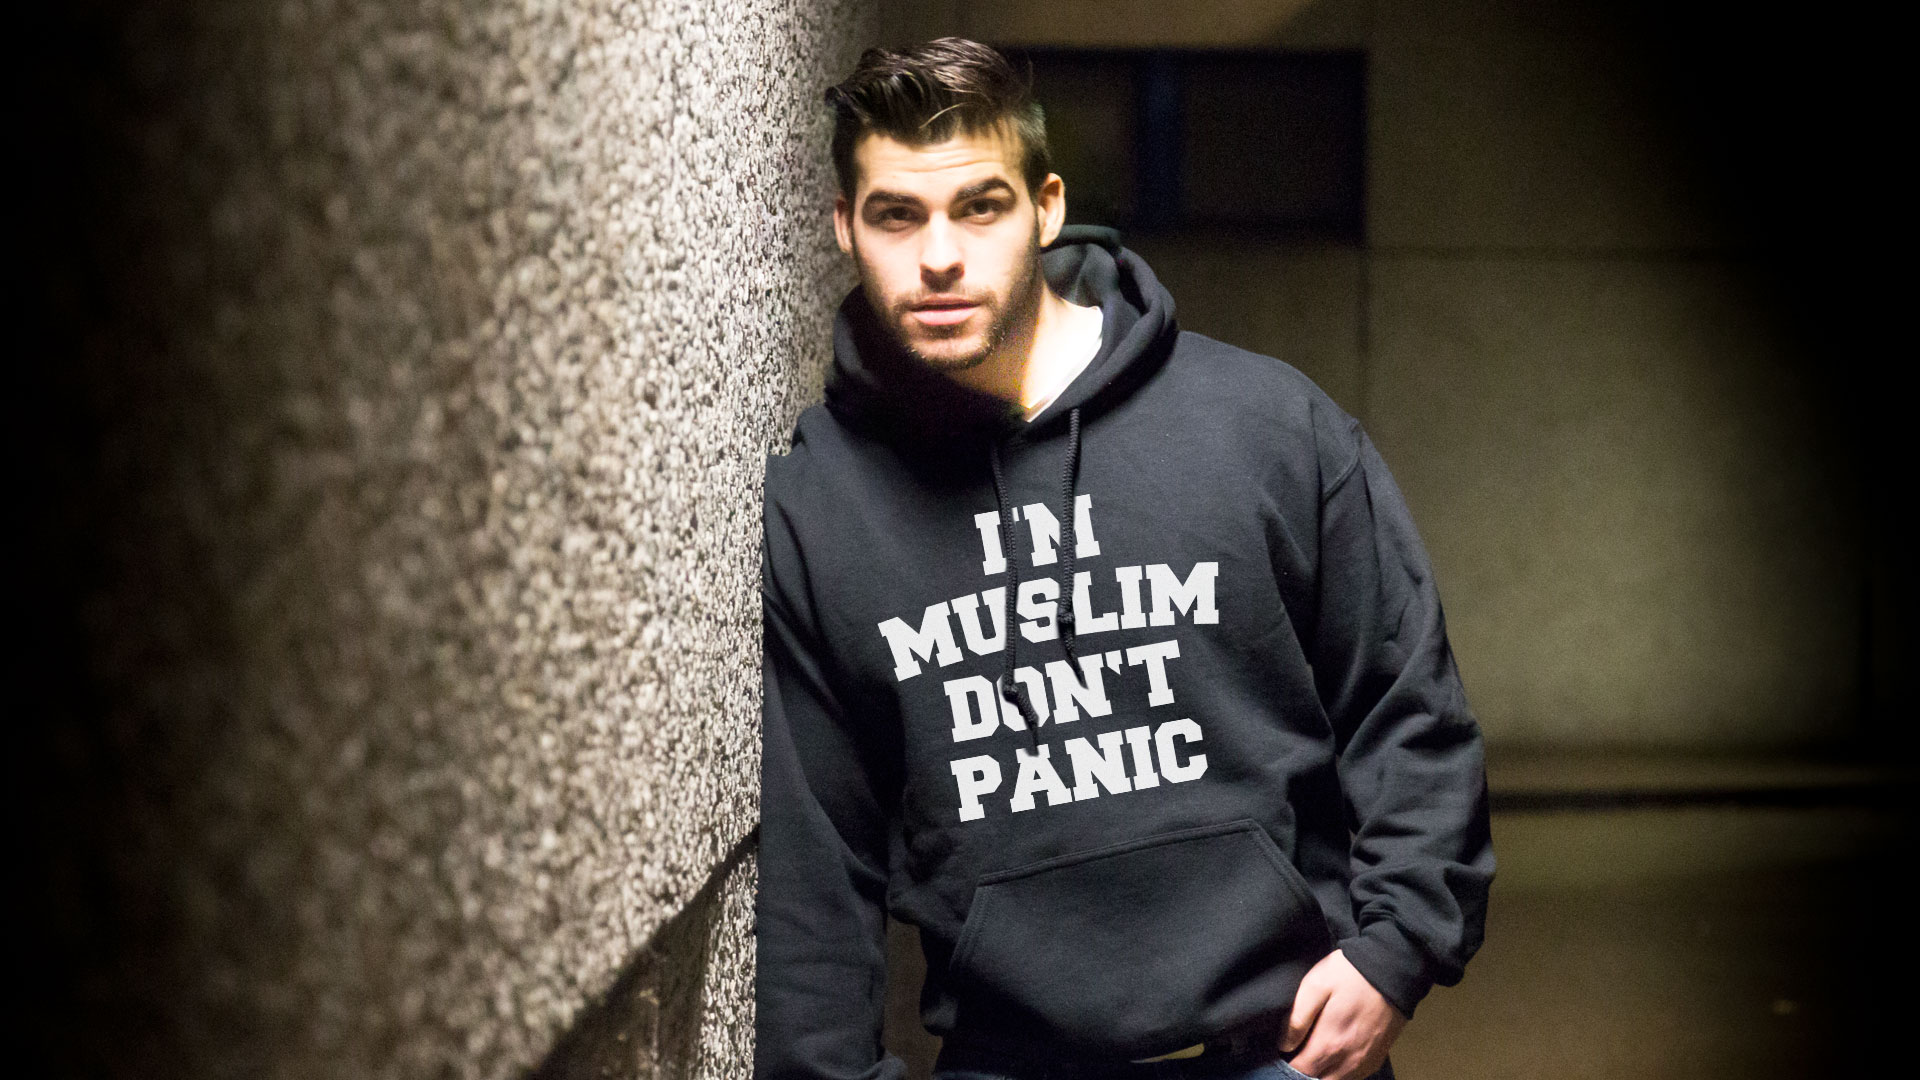 Islamische Streetwear Mode bei Halal-Wear.com - Islamische Kleidung